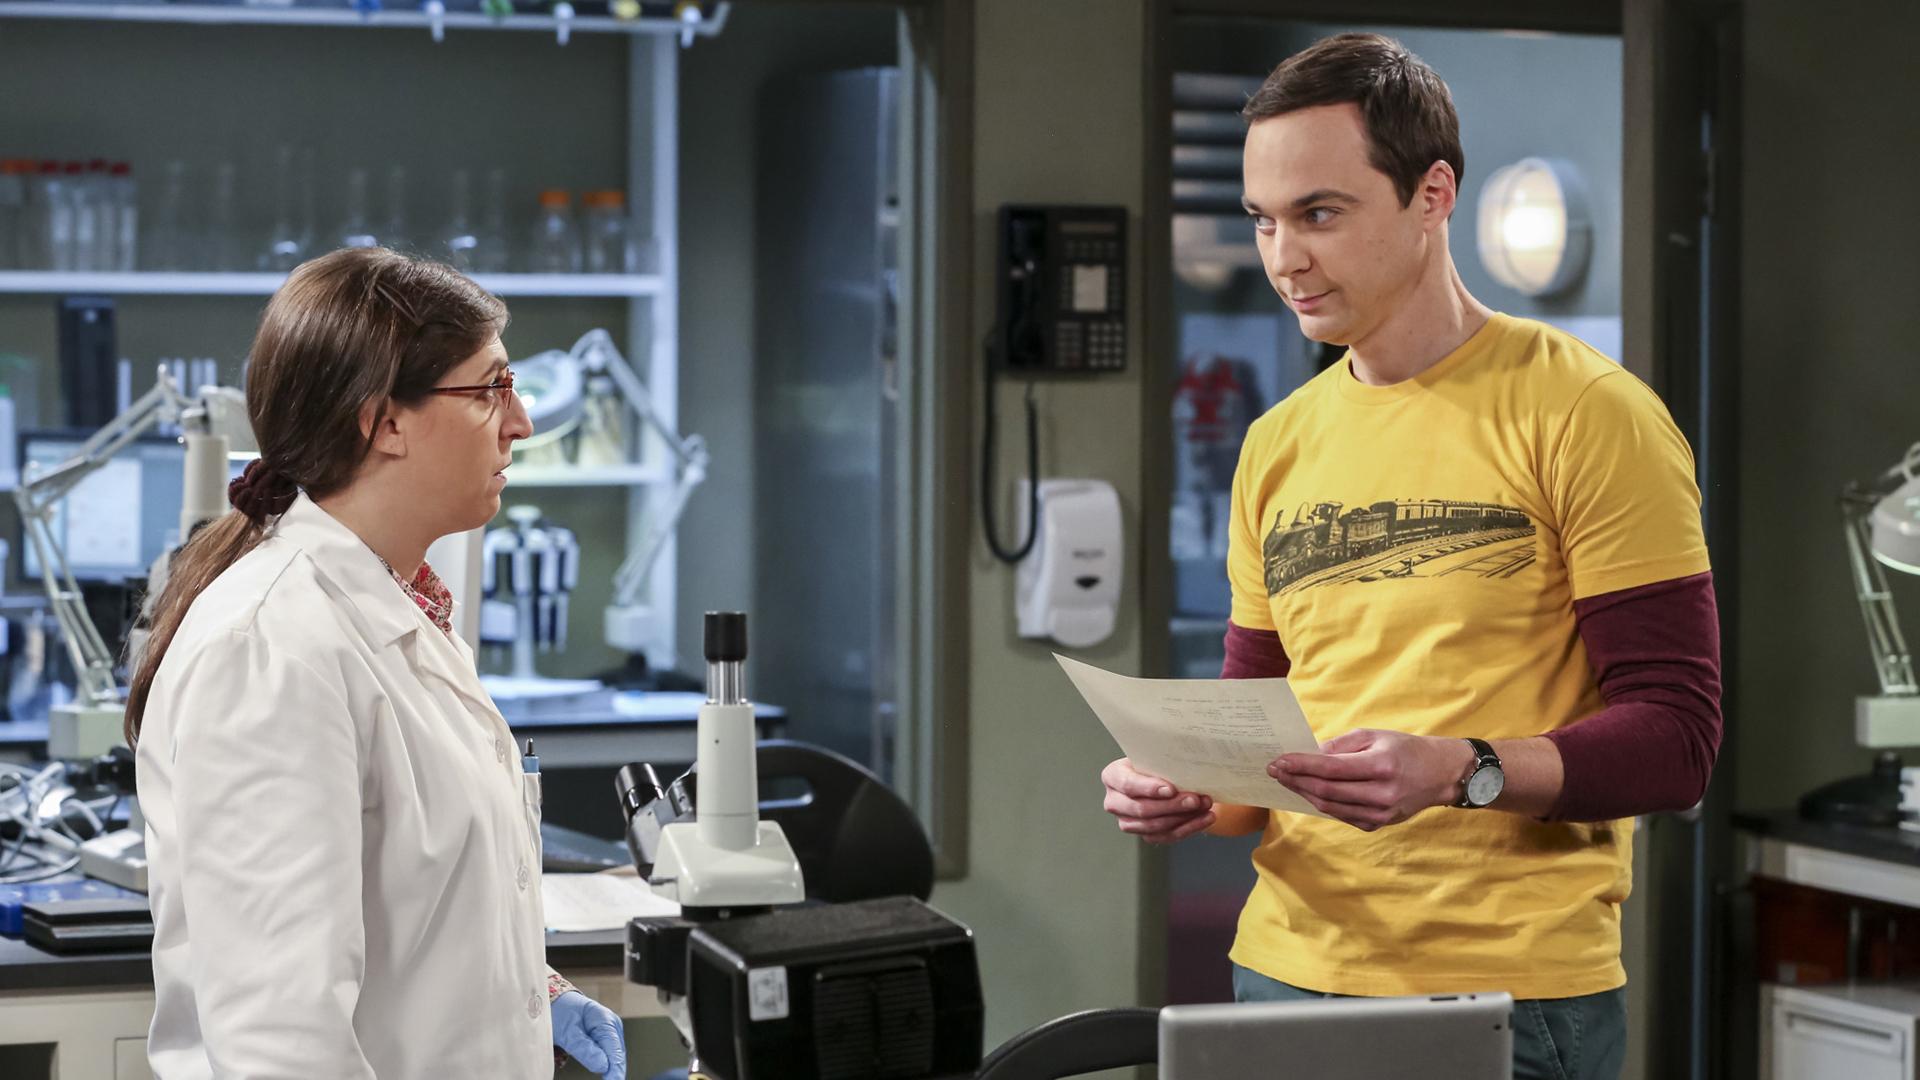 The wheels start turning in Sheldon's head.